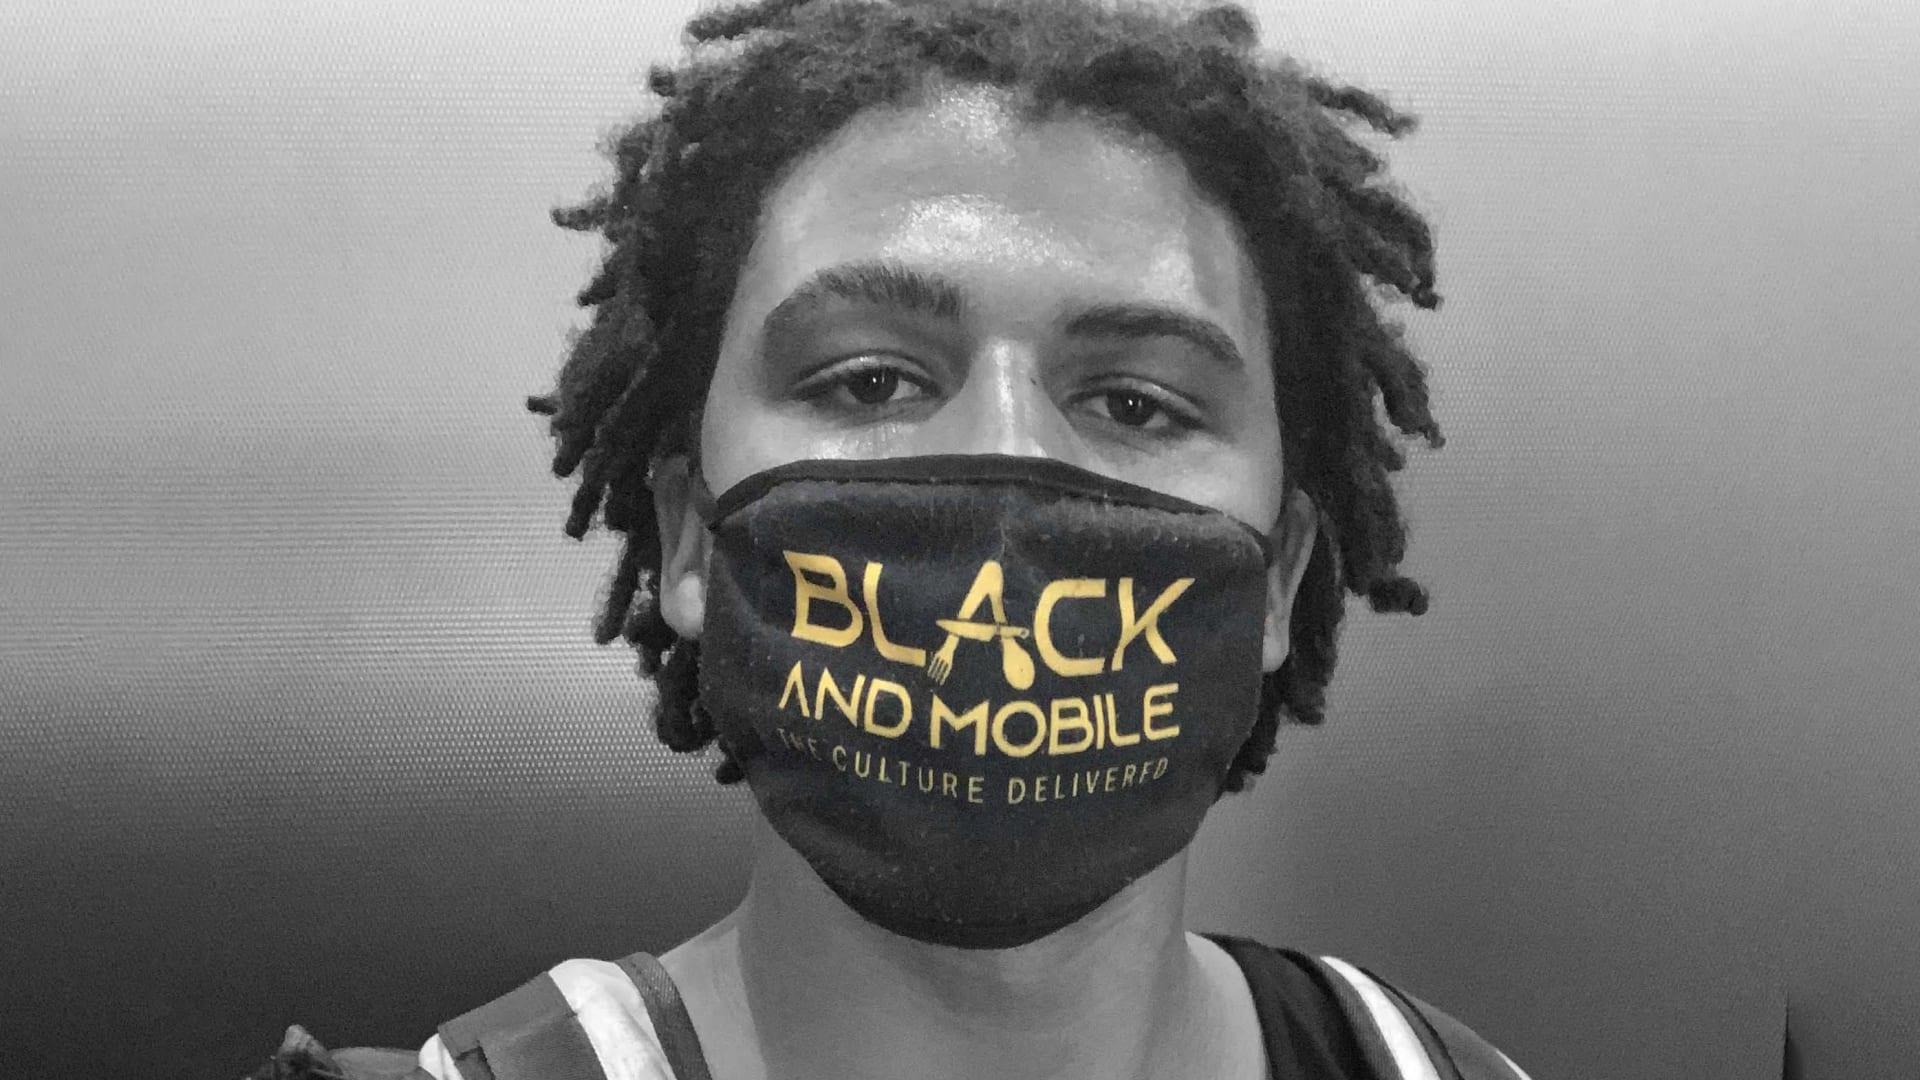 Black and Mobile founder David Cabello.